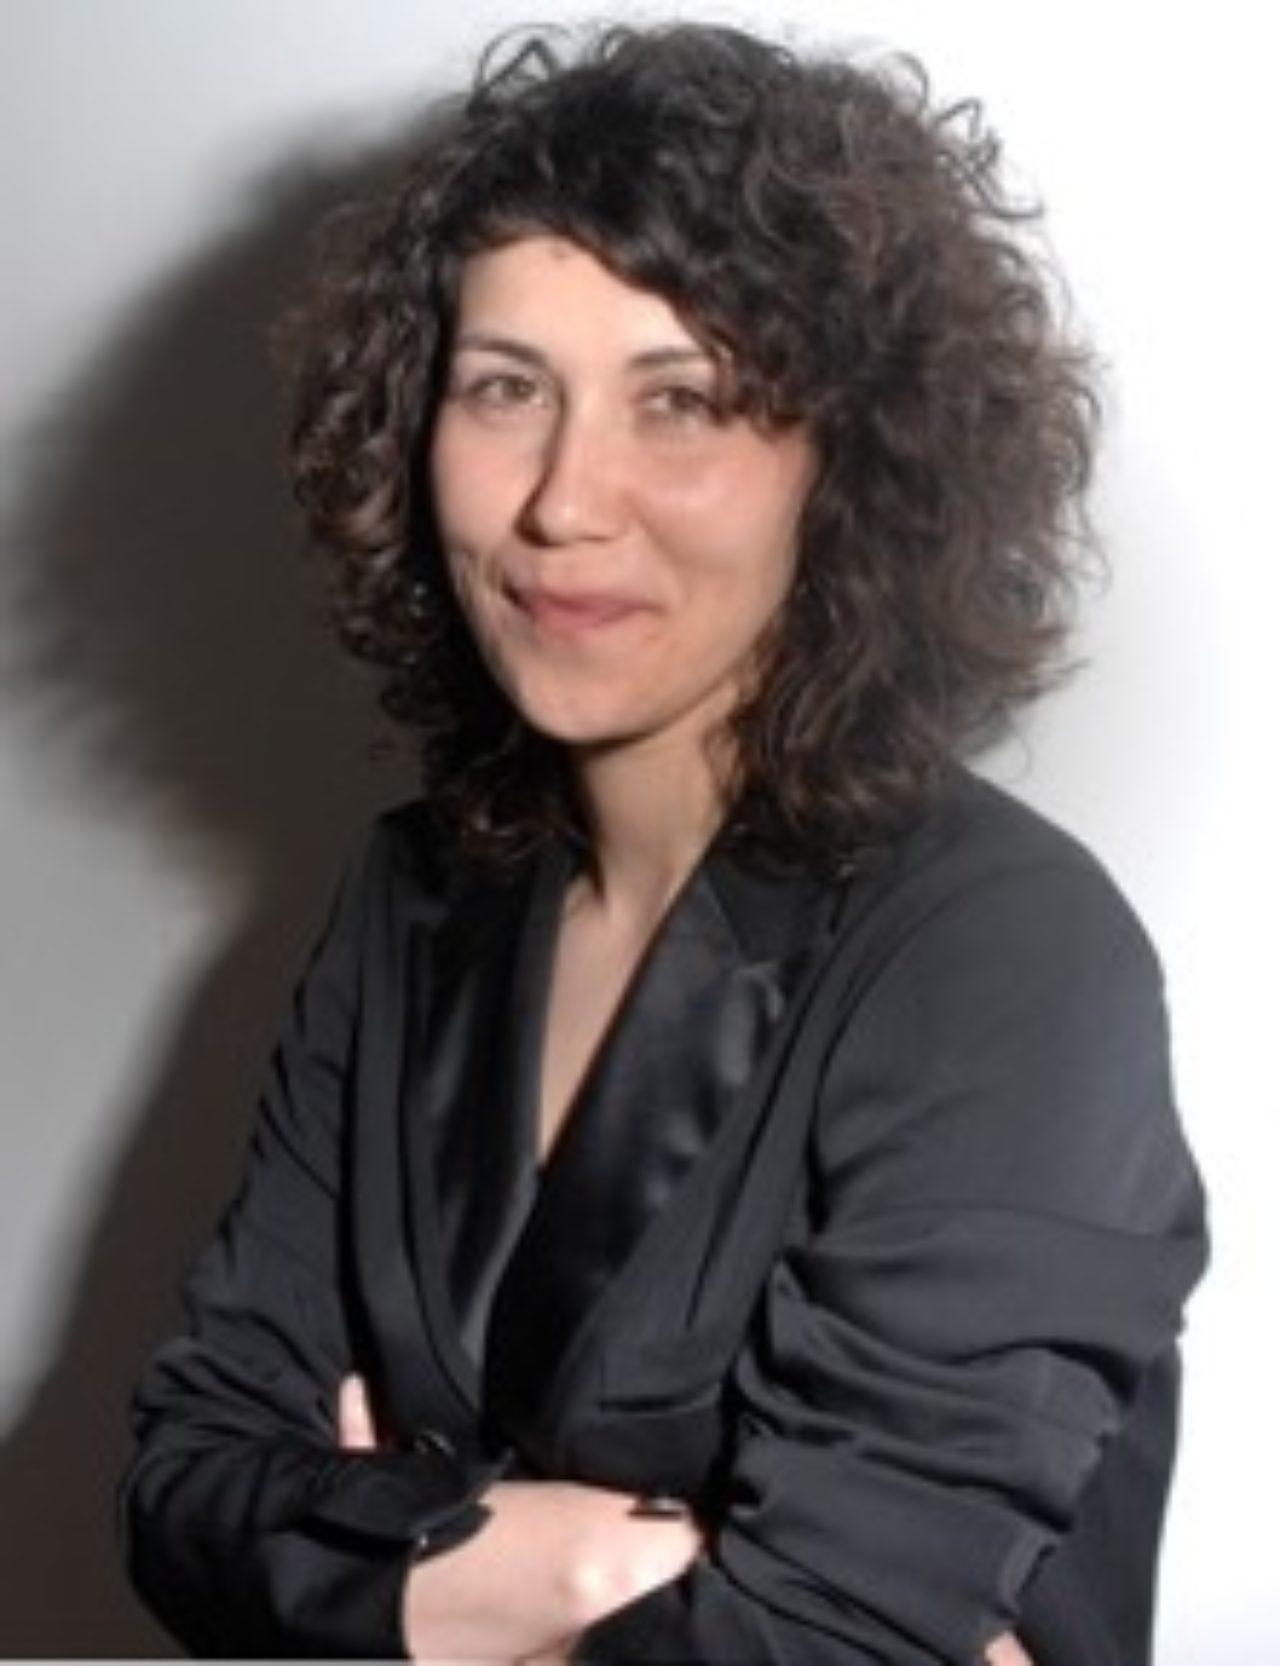 profielfoto van KABK Master Artistic Research docent Katarina Zdjelar